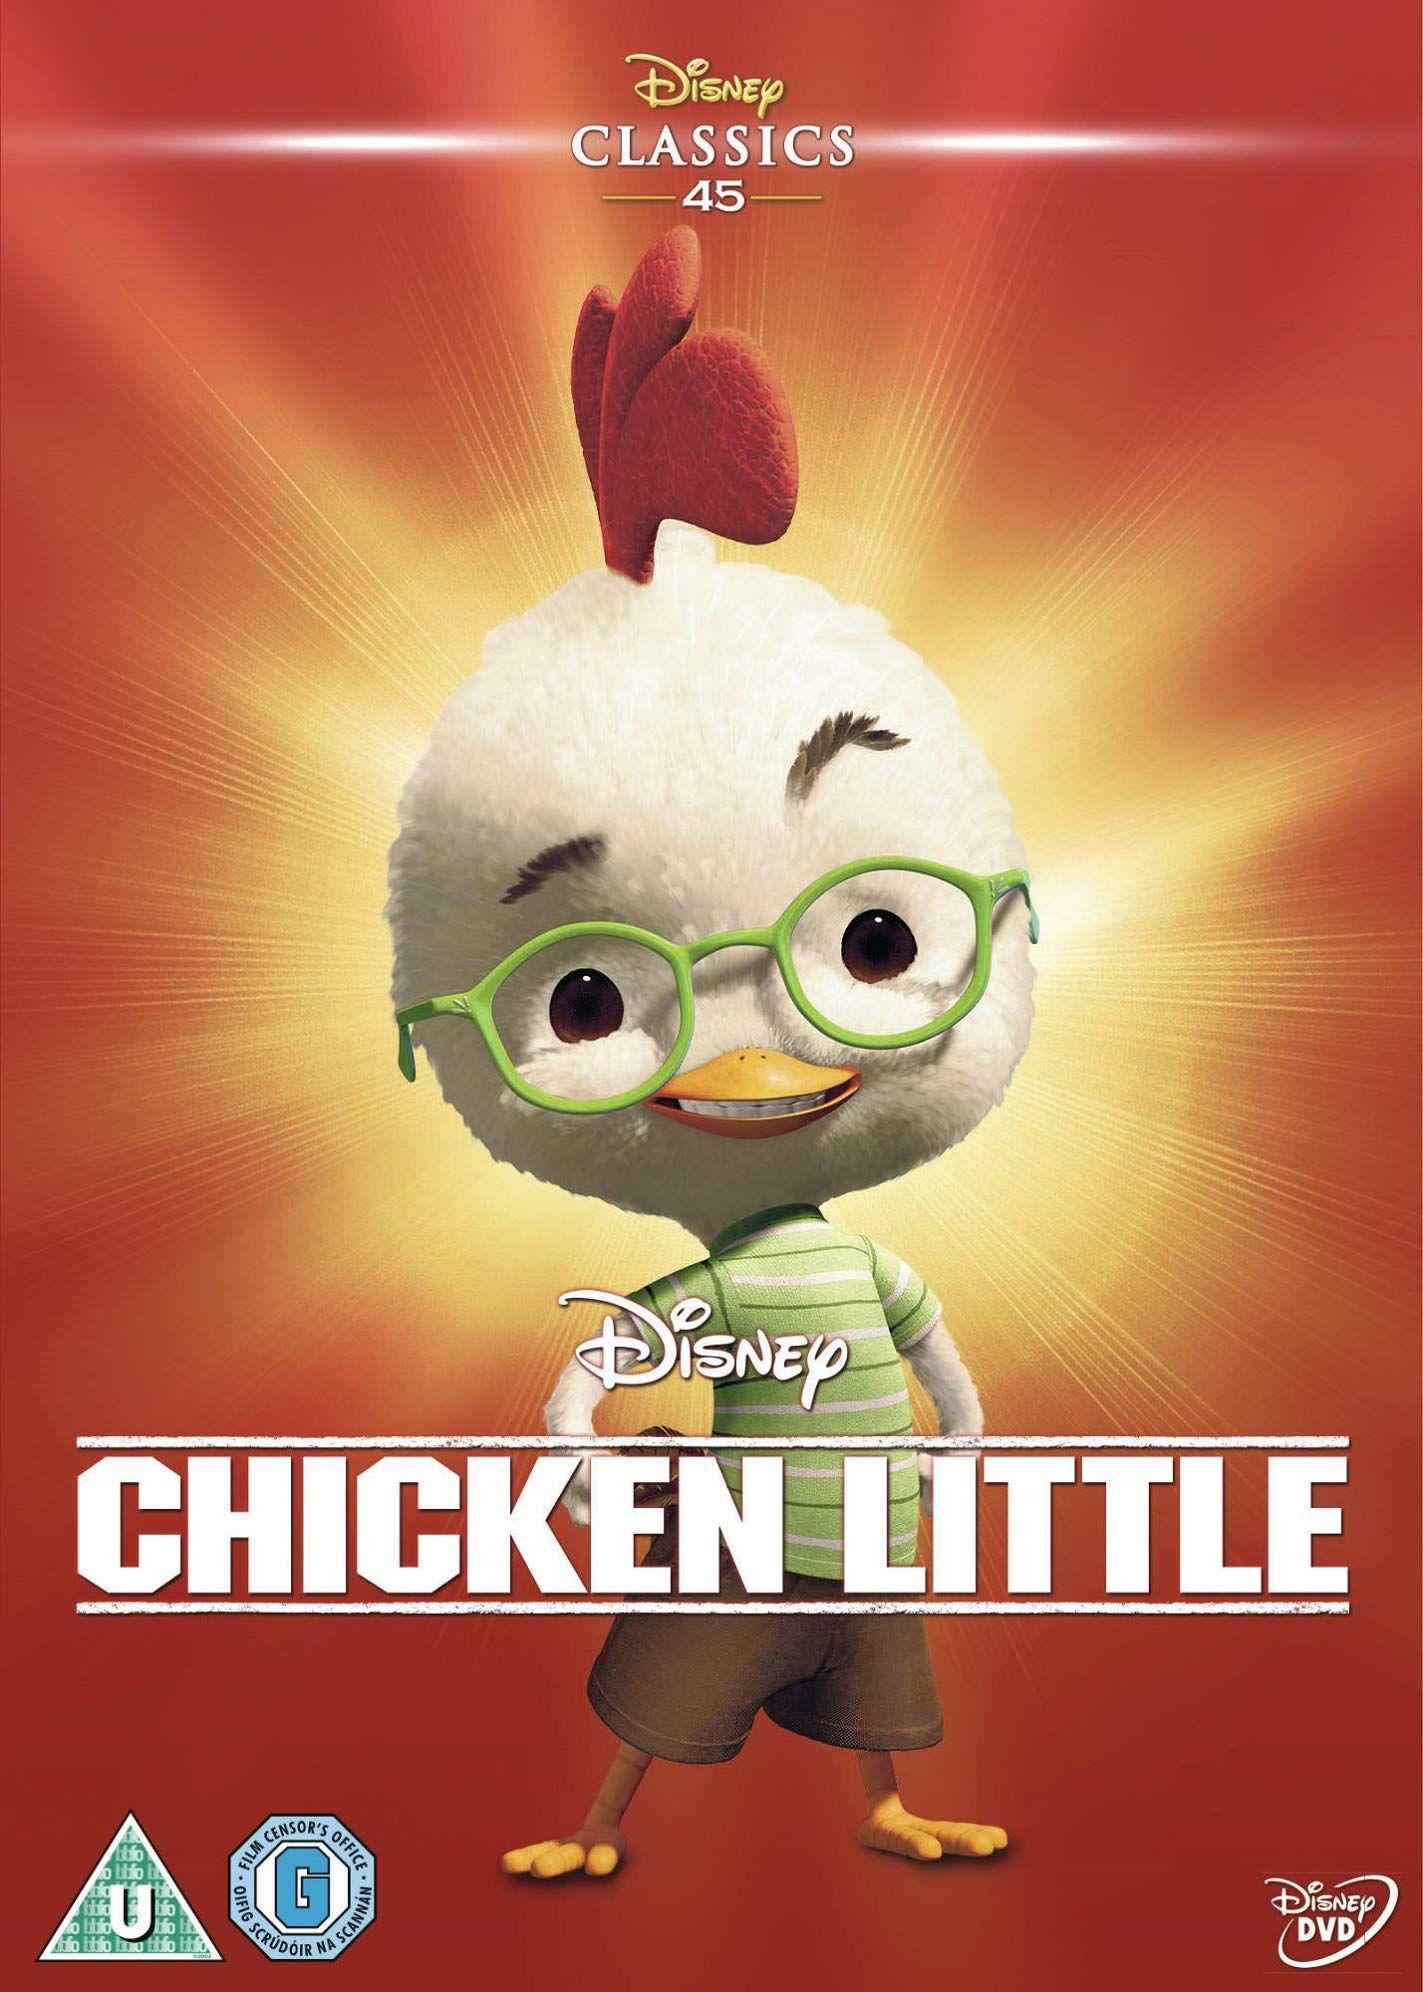 Chicken Little Reino Unido Dvd Reino Chicken Dvd Unido Chicken Little Peliculas De Disney Peliculas Dibujos Animados